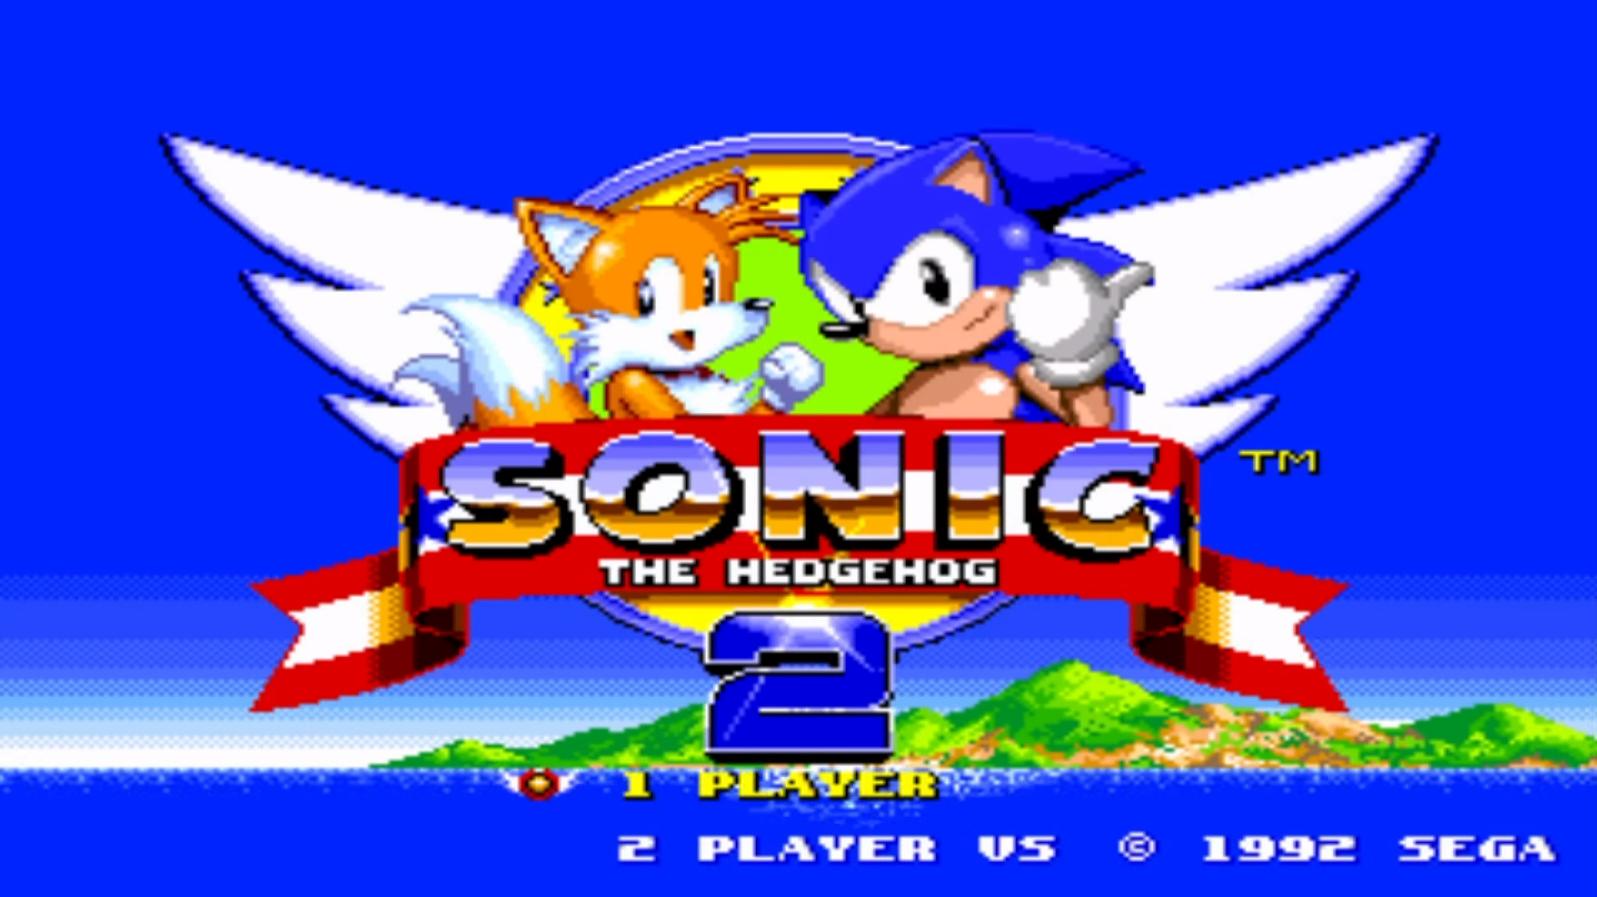 Old But Gold #35 - Sonic the Hedgehog 2 (e i suoi amici) 1